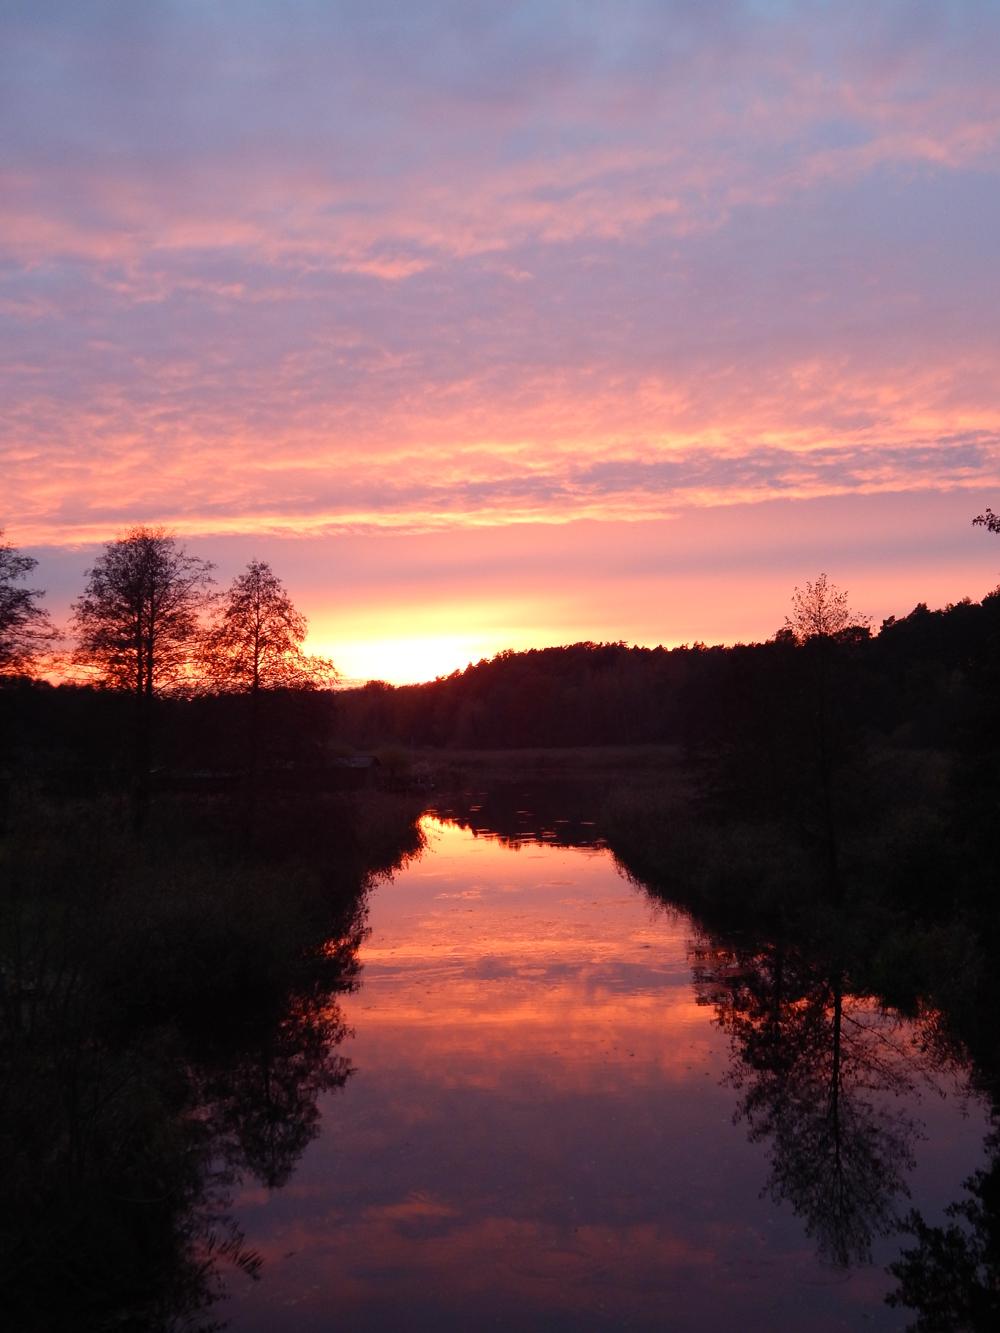 Abendstimmung am Templiner Kanal Ziegeleibrücke.